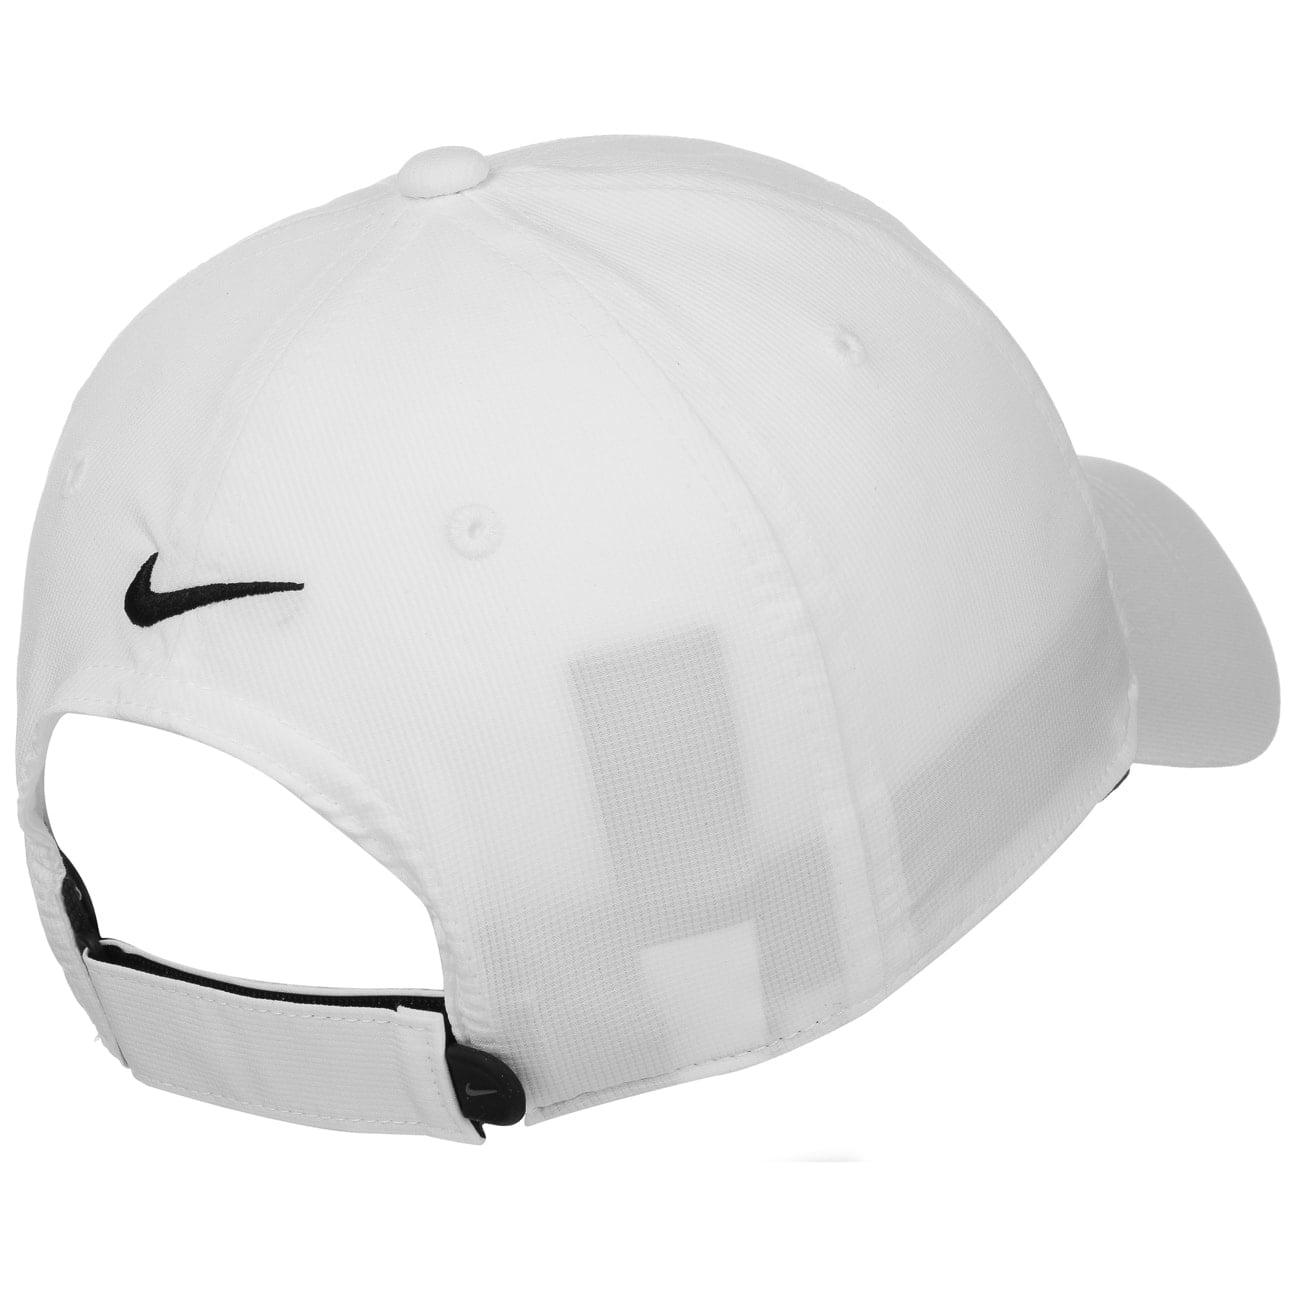 faeed856ce6 ... Legacy91 Tech Cap by Nike - white 4 ...